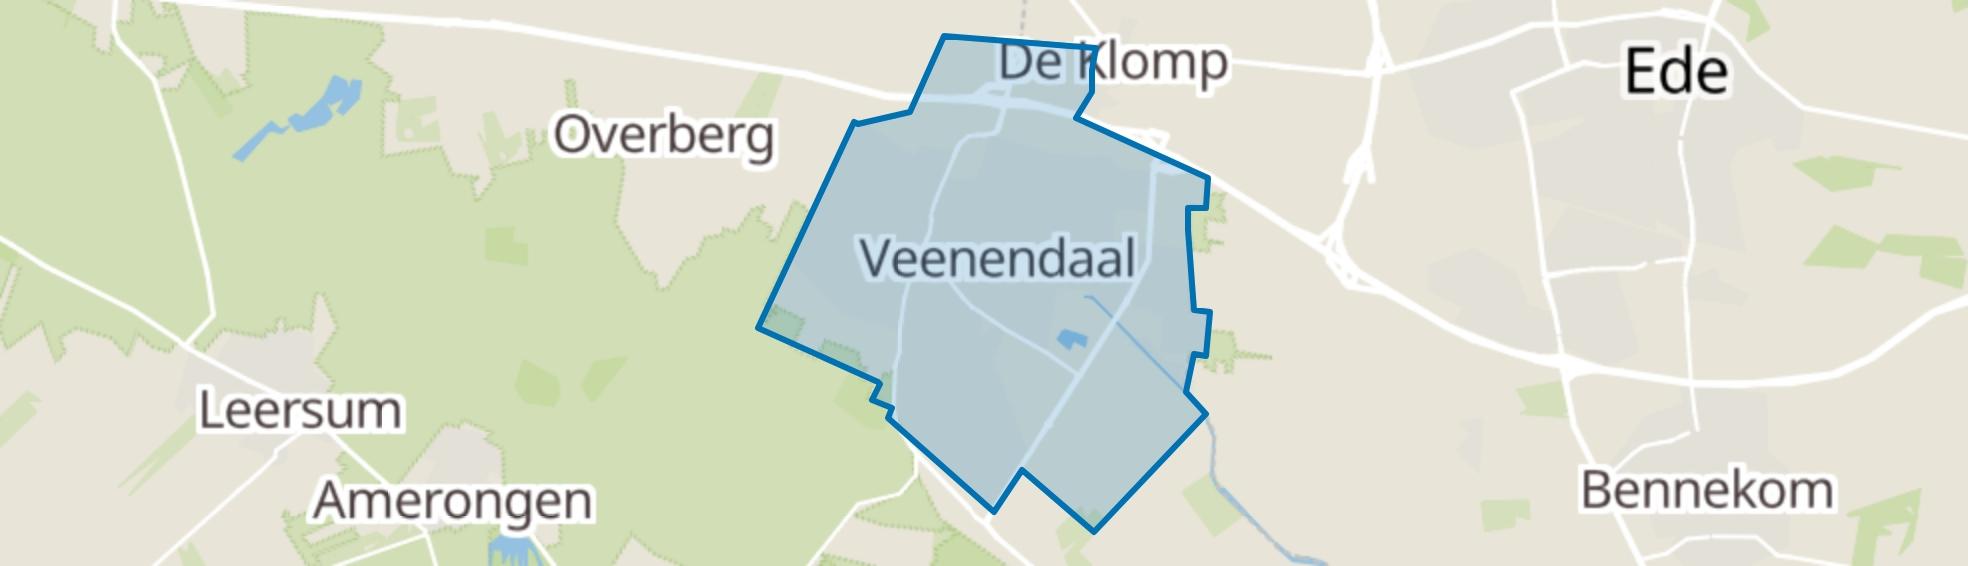 Veenendaal map